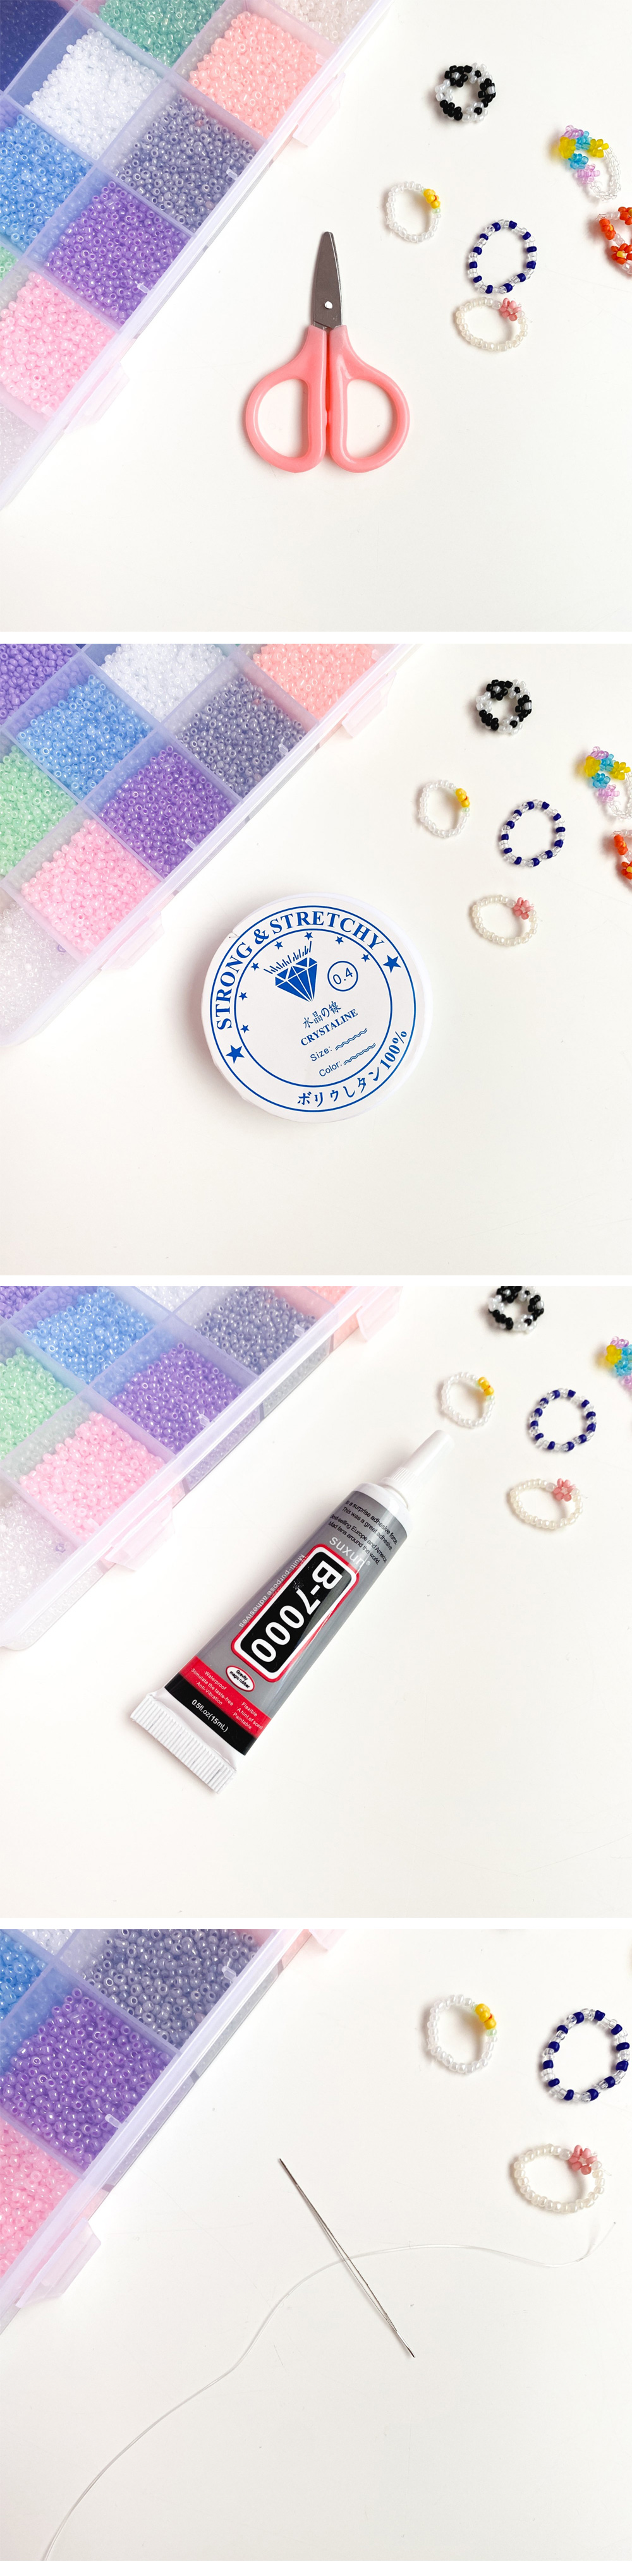 Bead Ring Mask Band DIY Making Kit Set 24color